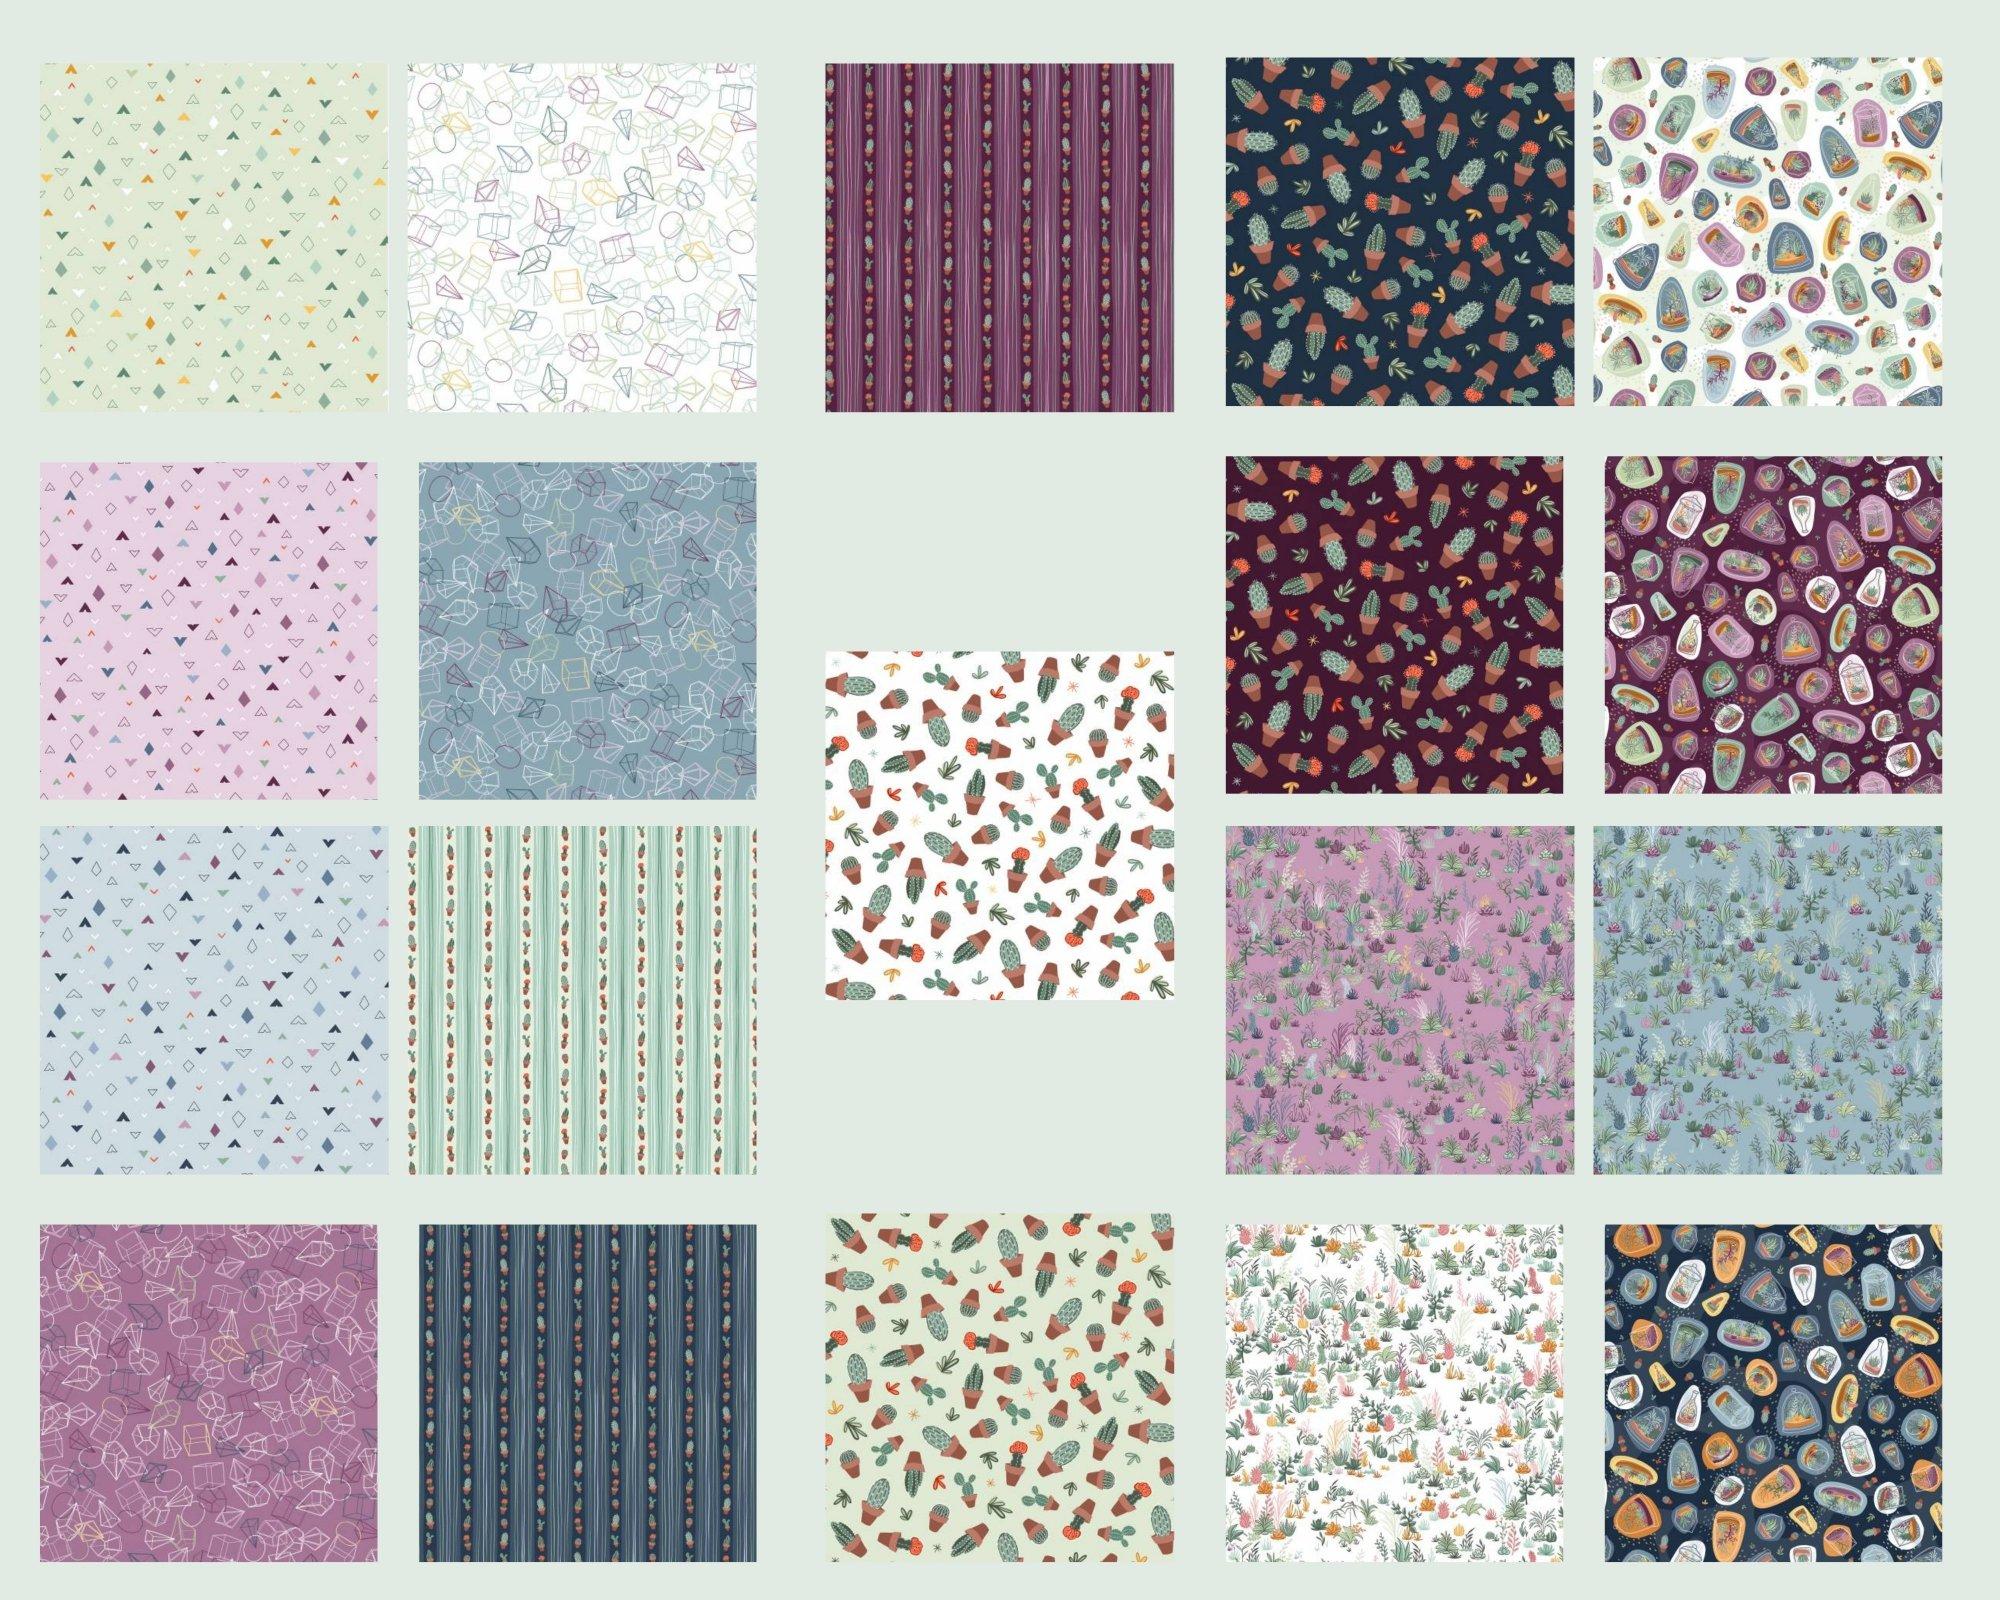 Greenhouse Gardens - Fat Quarter Bundle 19pc/bundle - By Alicia Dujets For Michael Miller Fabrics